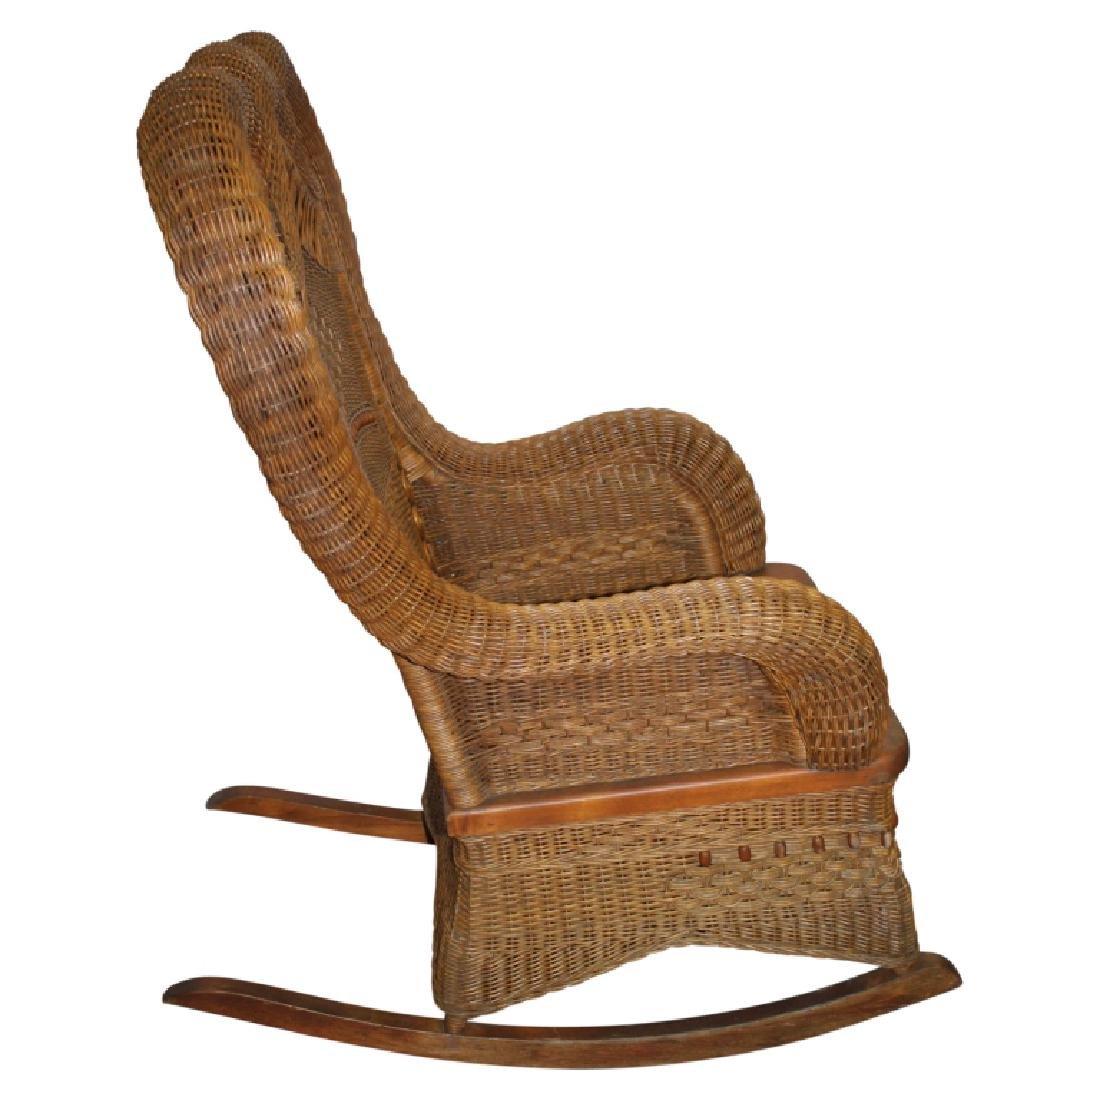 Heywood Wakefield Wicker Style Rocking Chair - 3